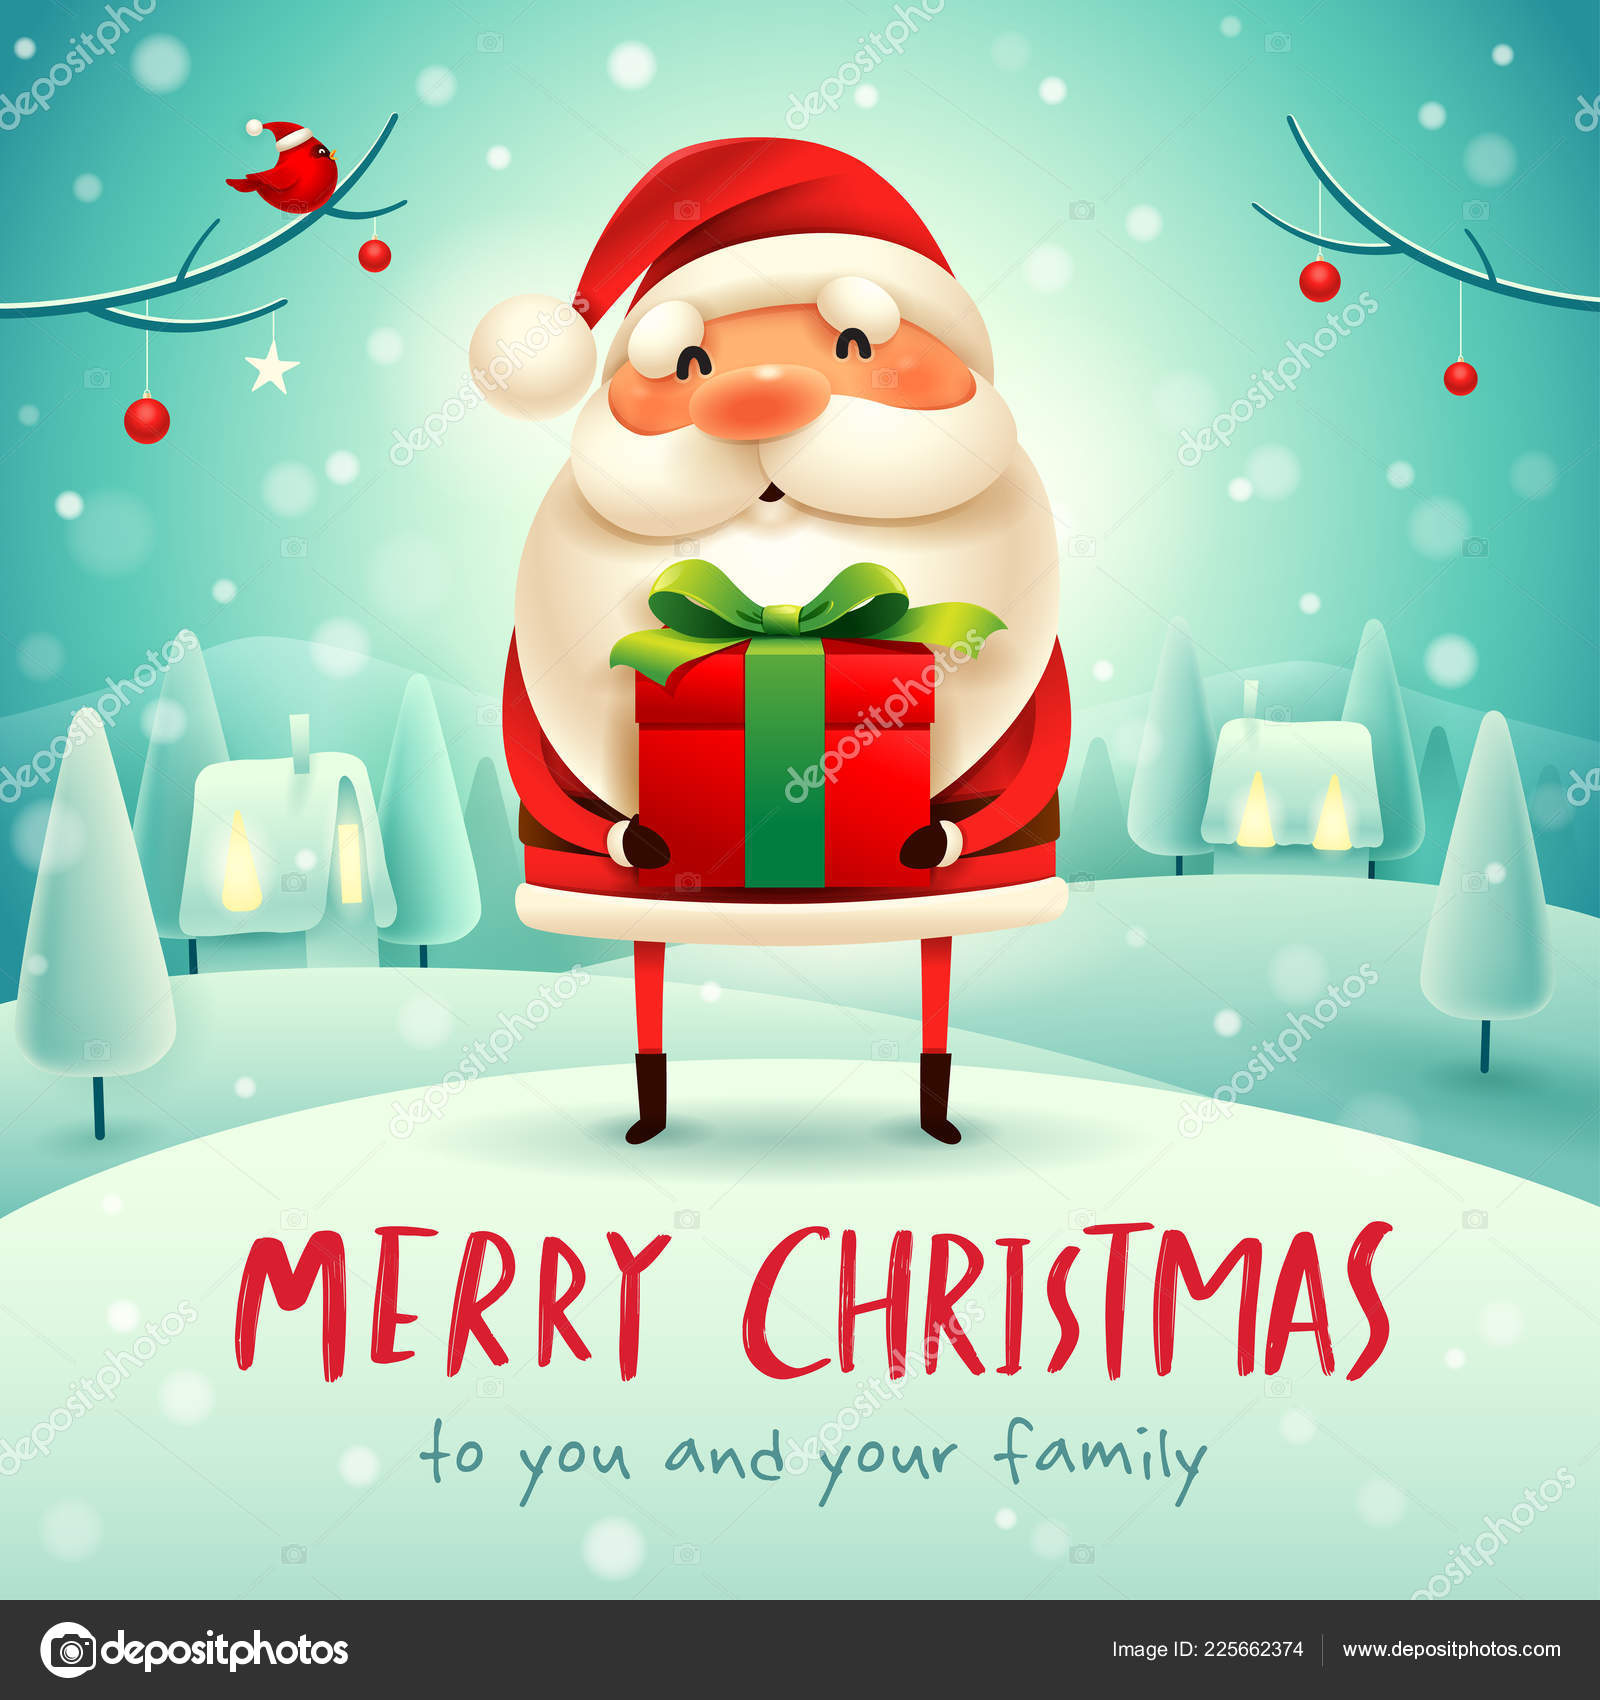 Merry Christmas Santa Claus Gift Present Christmas Snow Scene Winter ...